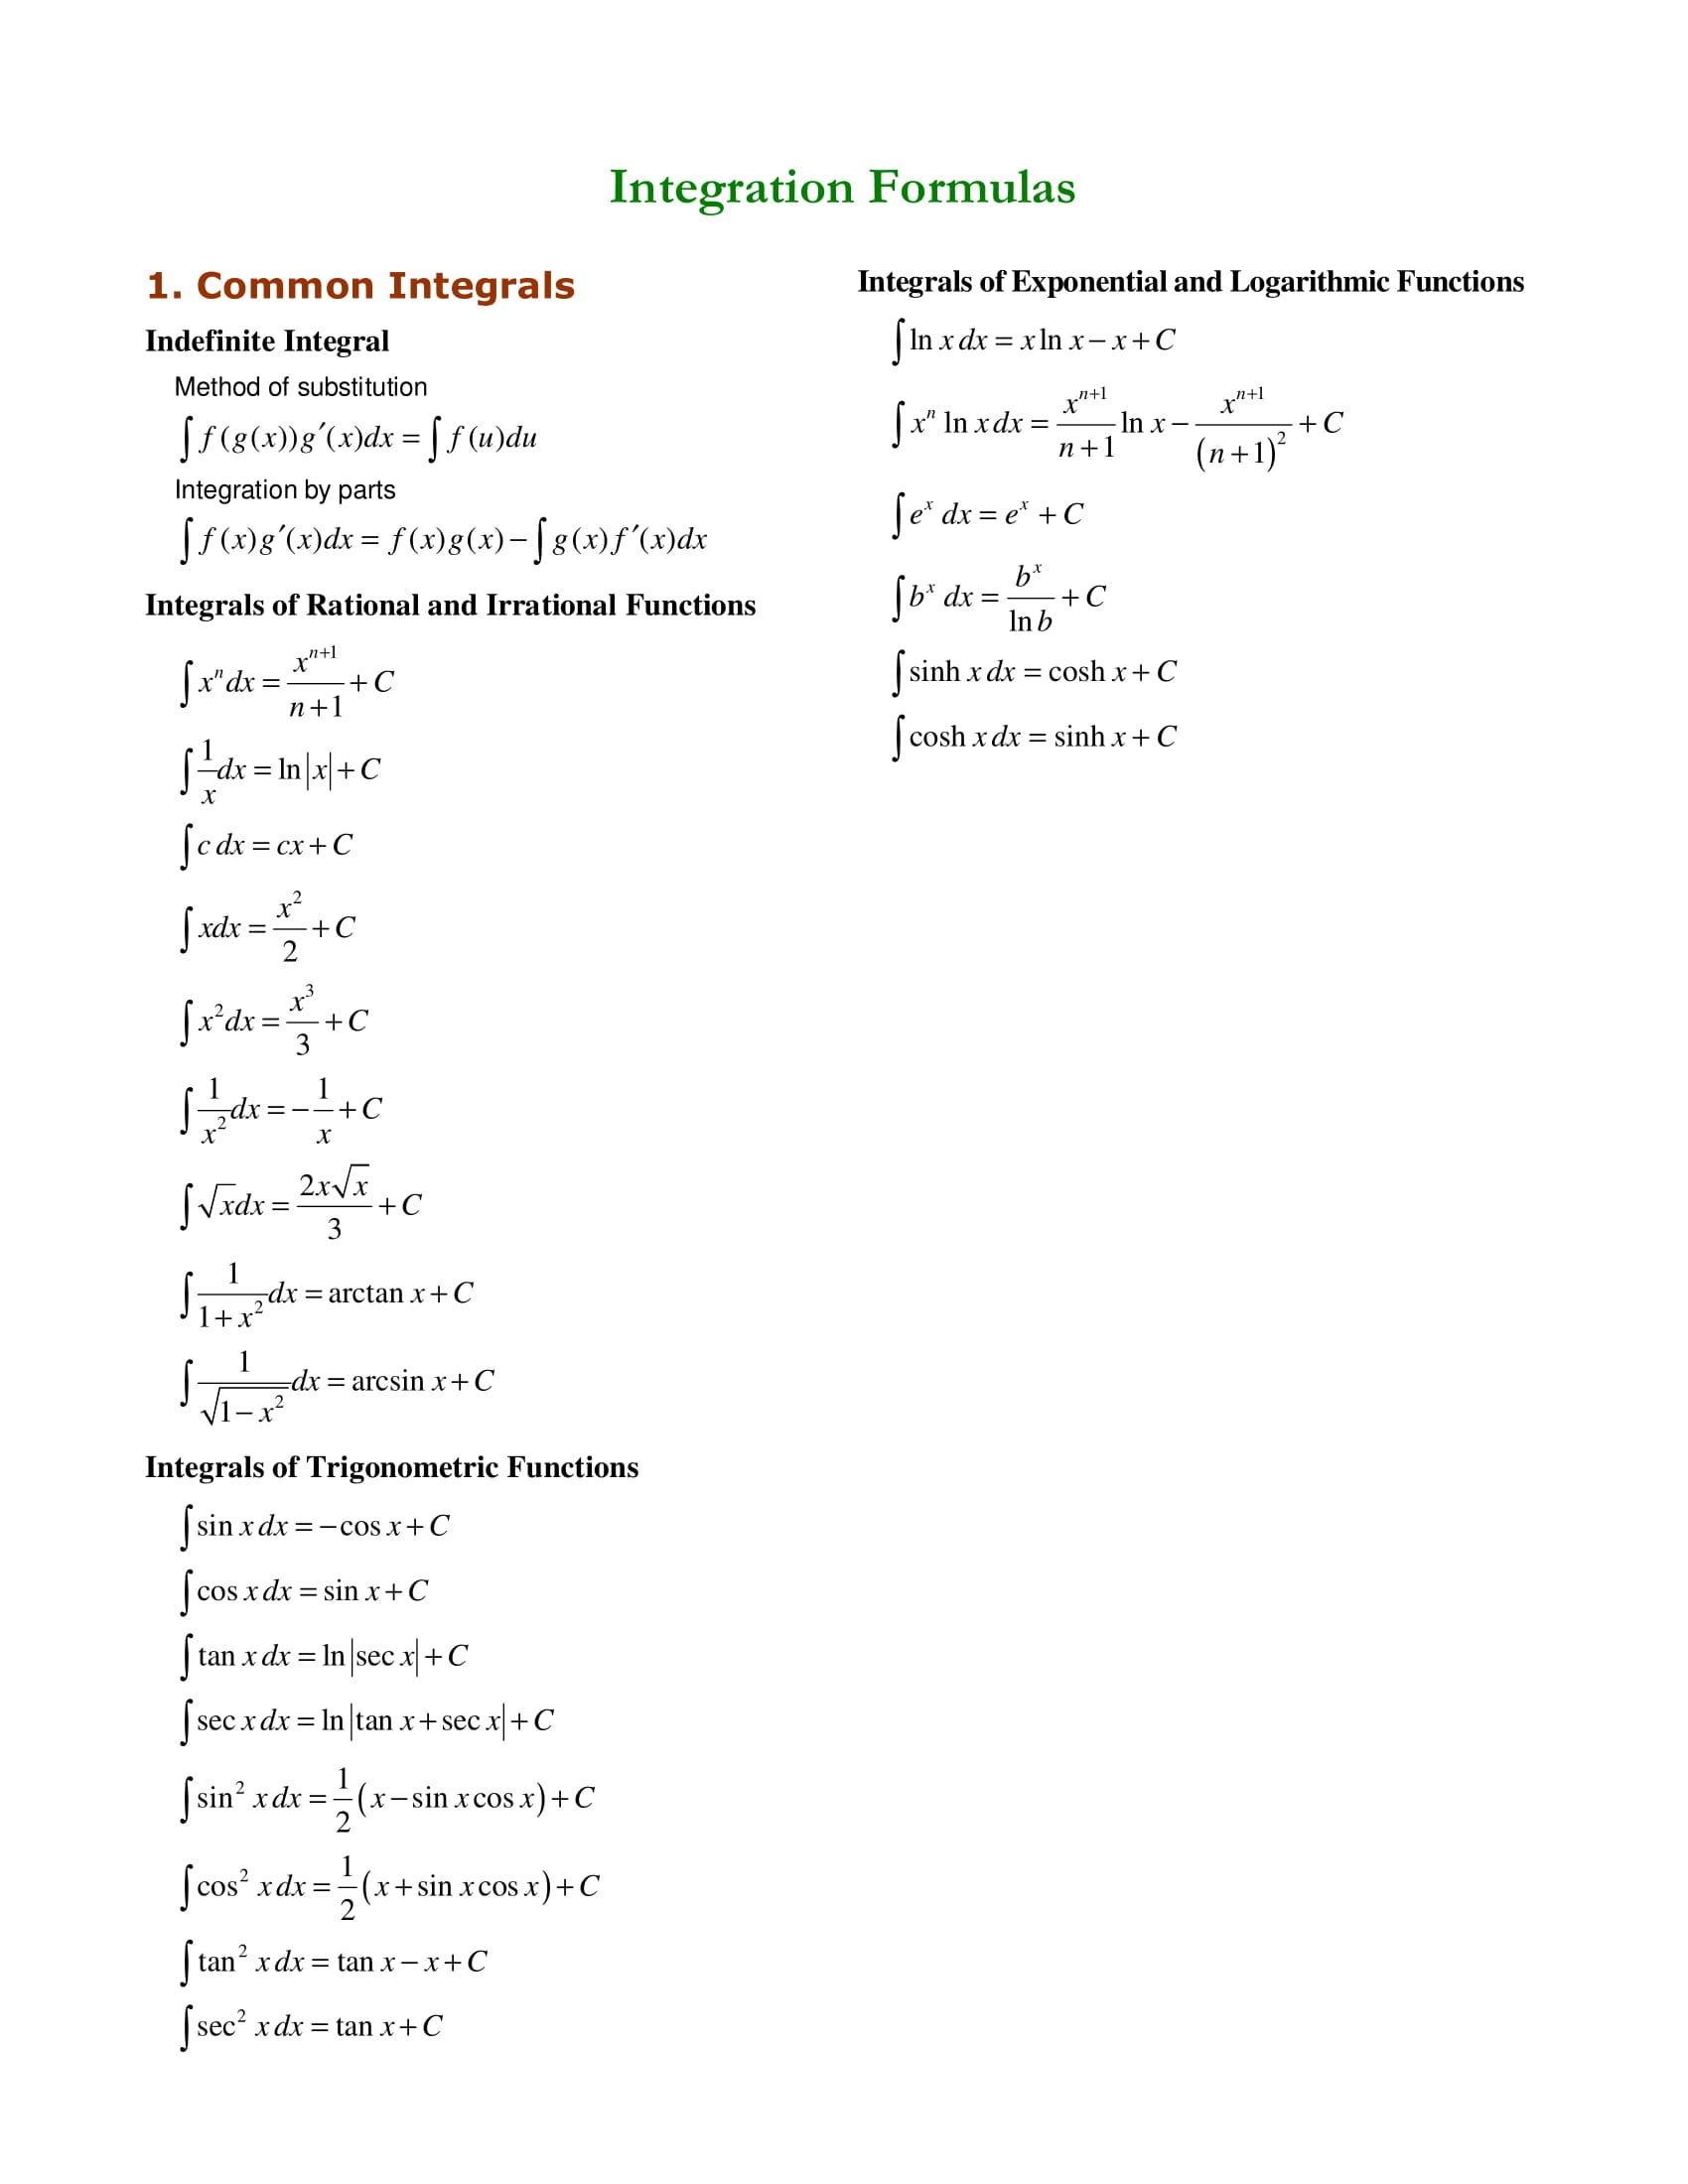 Integration Formula For Trigonometry Function